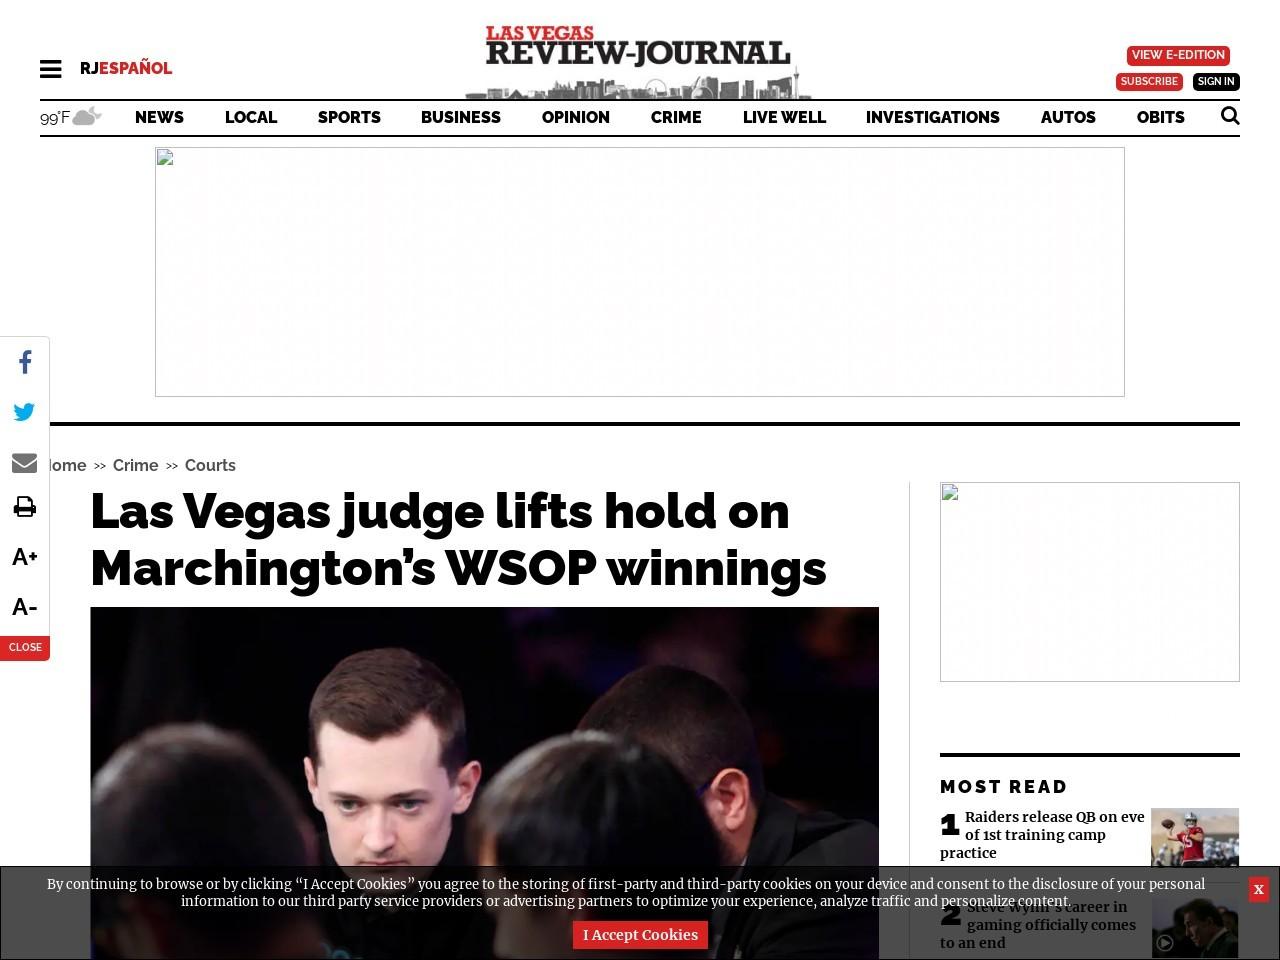 Las Vegas judge lifts hold on Marchington's WSOP winnings